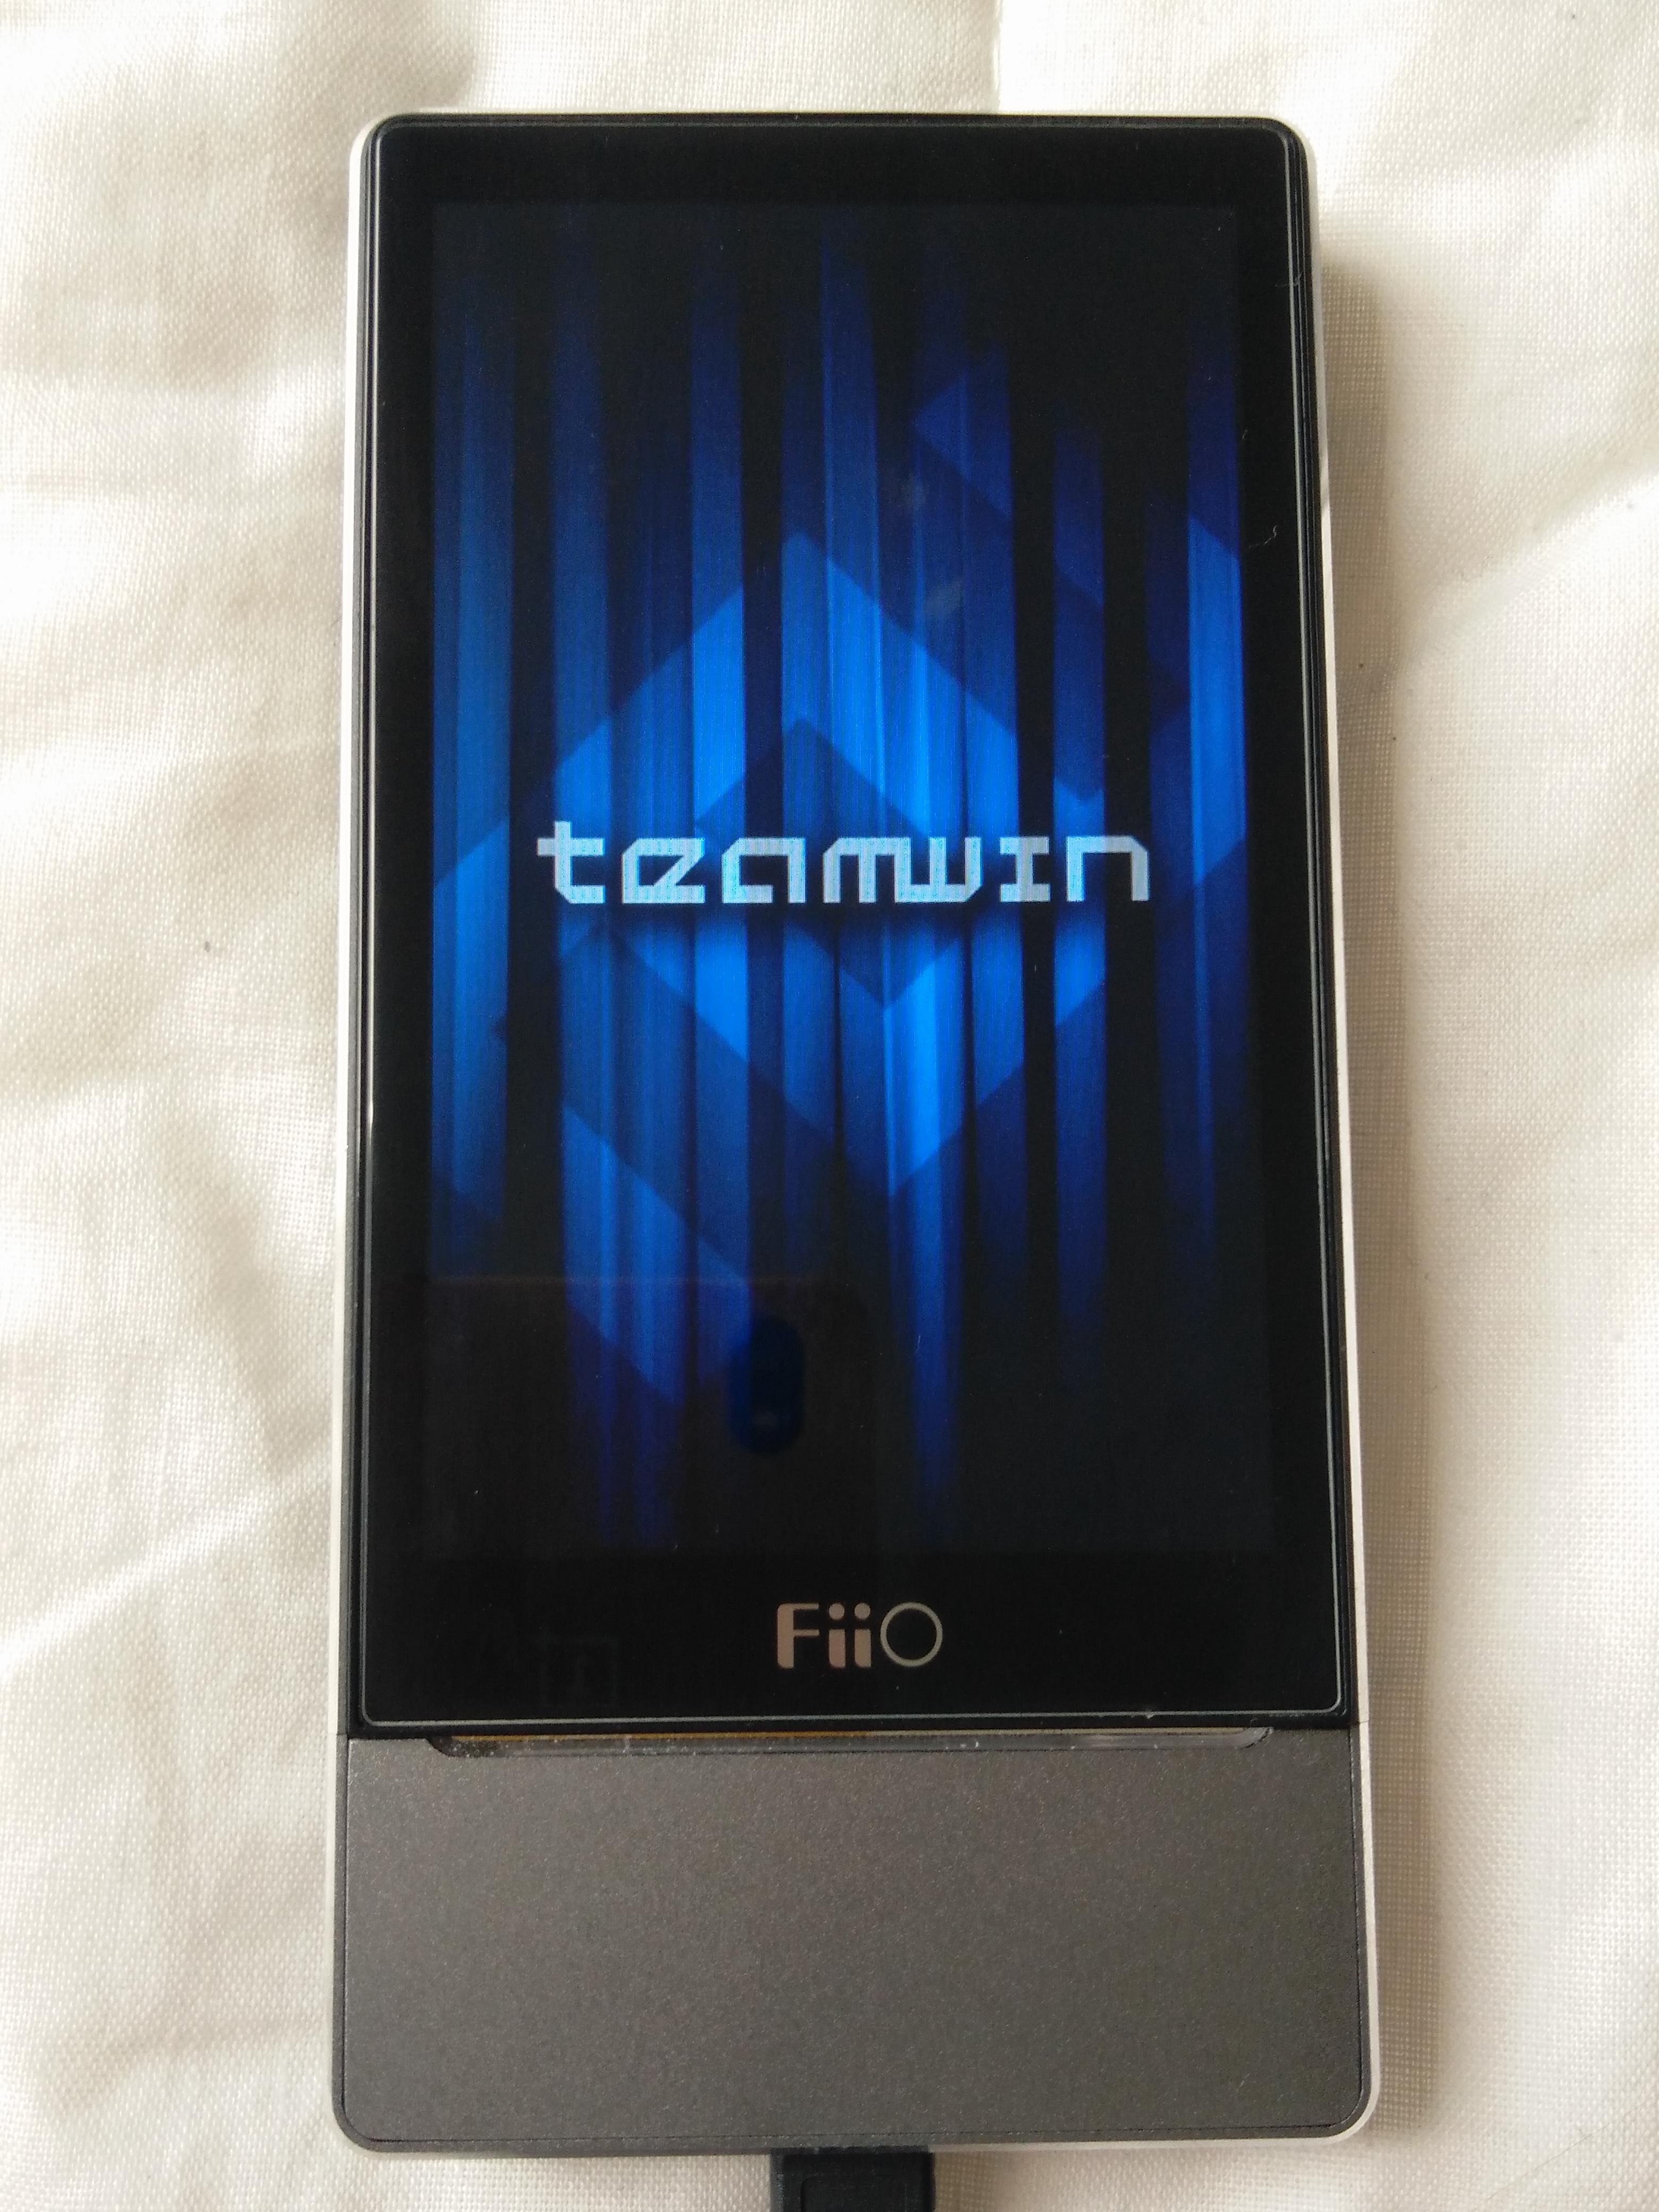 FiiO X7 | DXD | DSD | 384K/64B | ESS9018+ Android | WiFi | Bluetooth